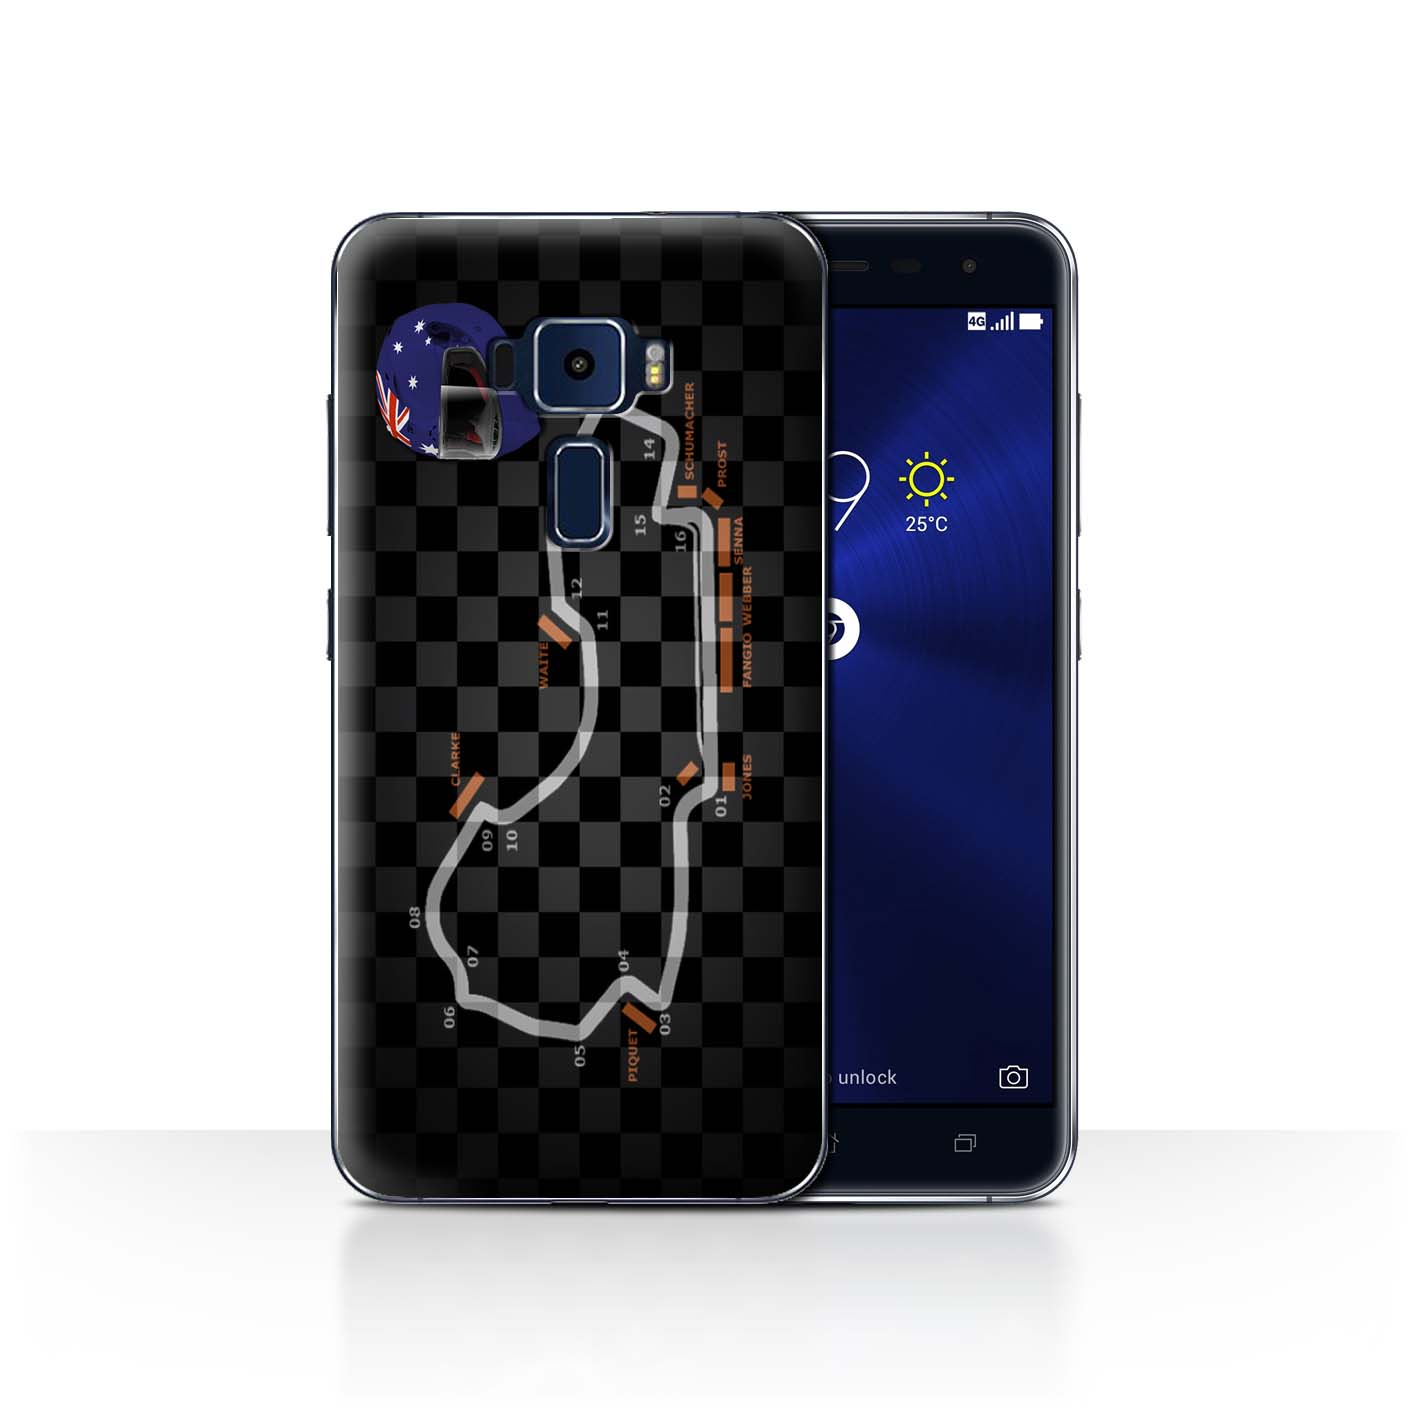 STUFF4-Back-Case-Cover-Skin-for-Asus-Zenfone-3-ZE552KL-2014-F1-Track